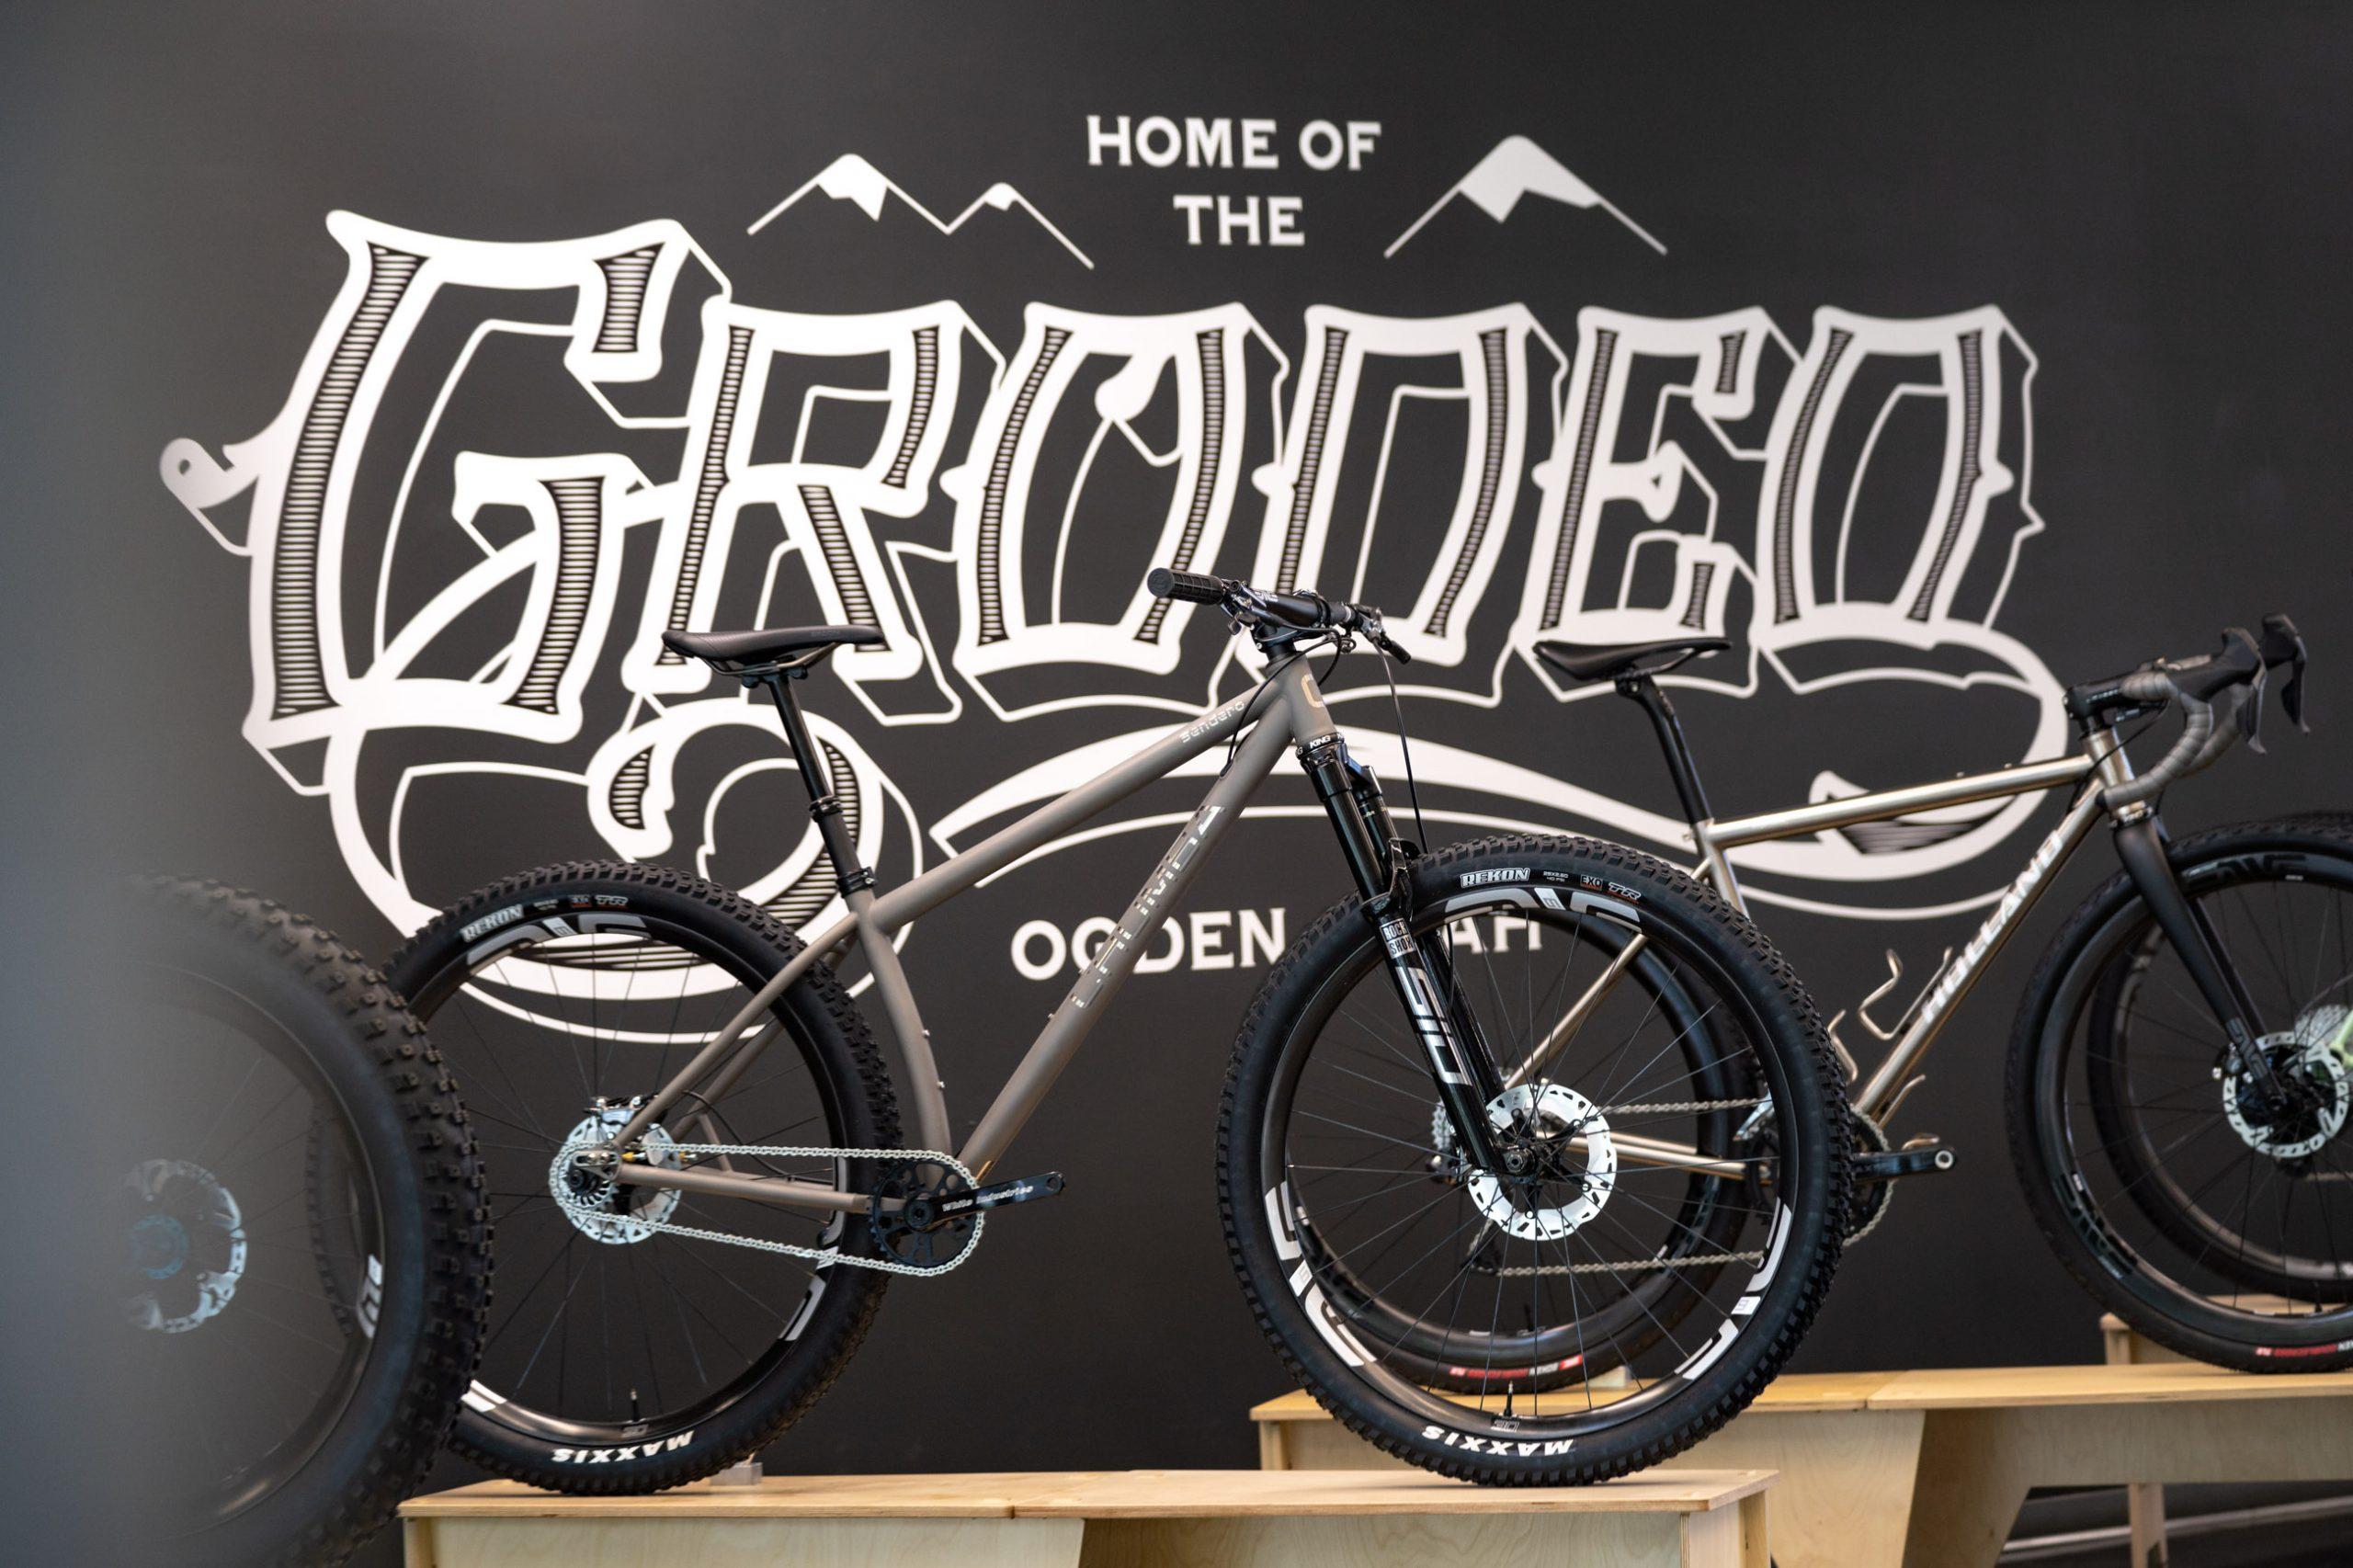 Grodeo Custom Bike Round-Up & Ride de ENVE trae lo mejor del ciclismo a Wasatch